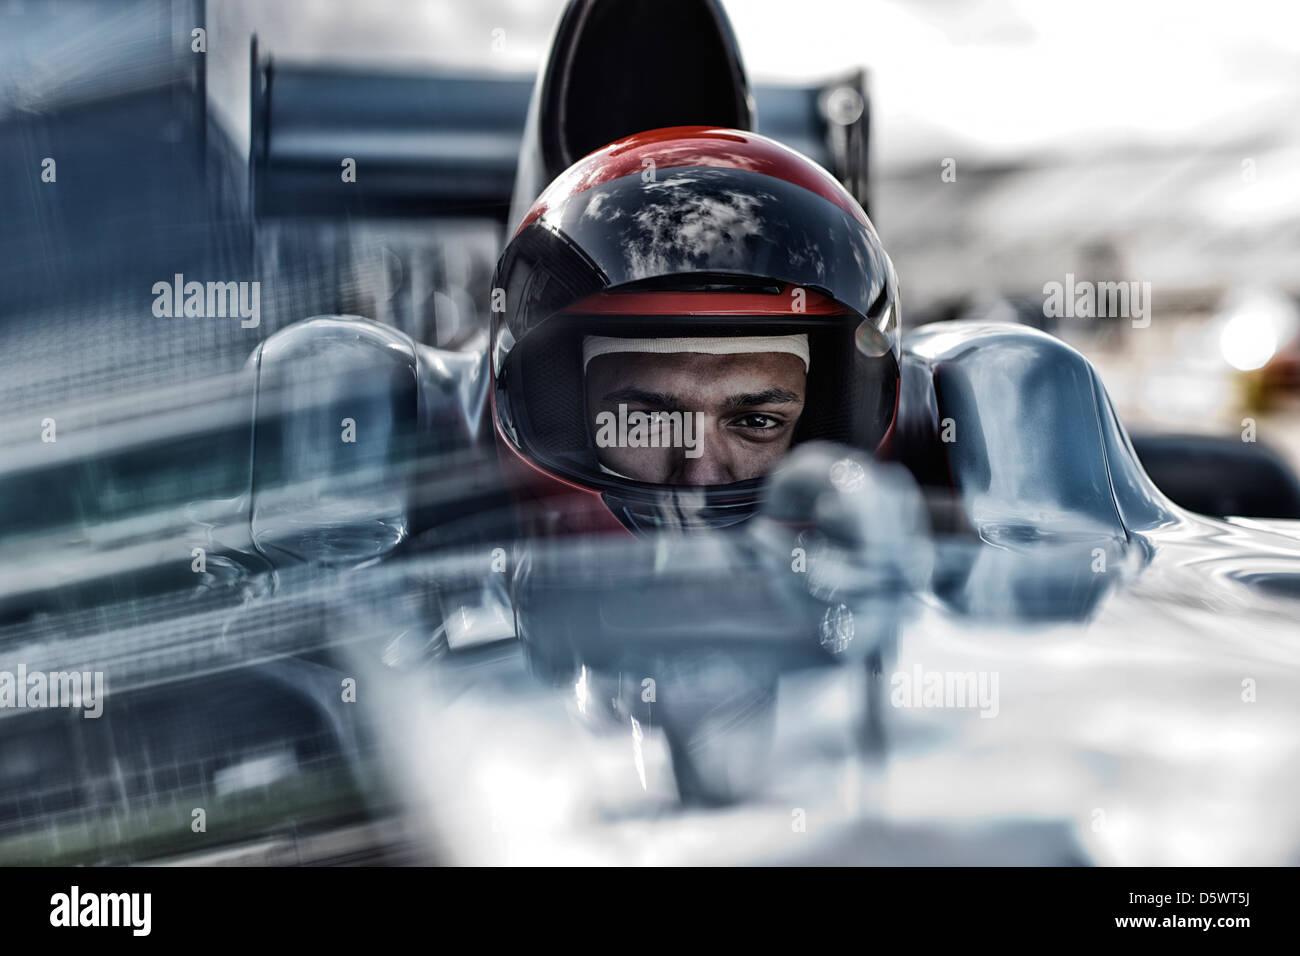 Racer sitting in car - Stock Image